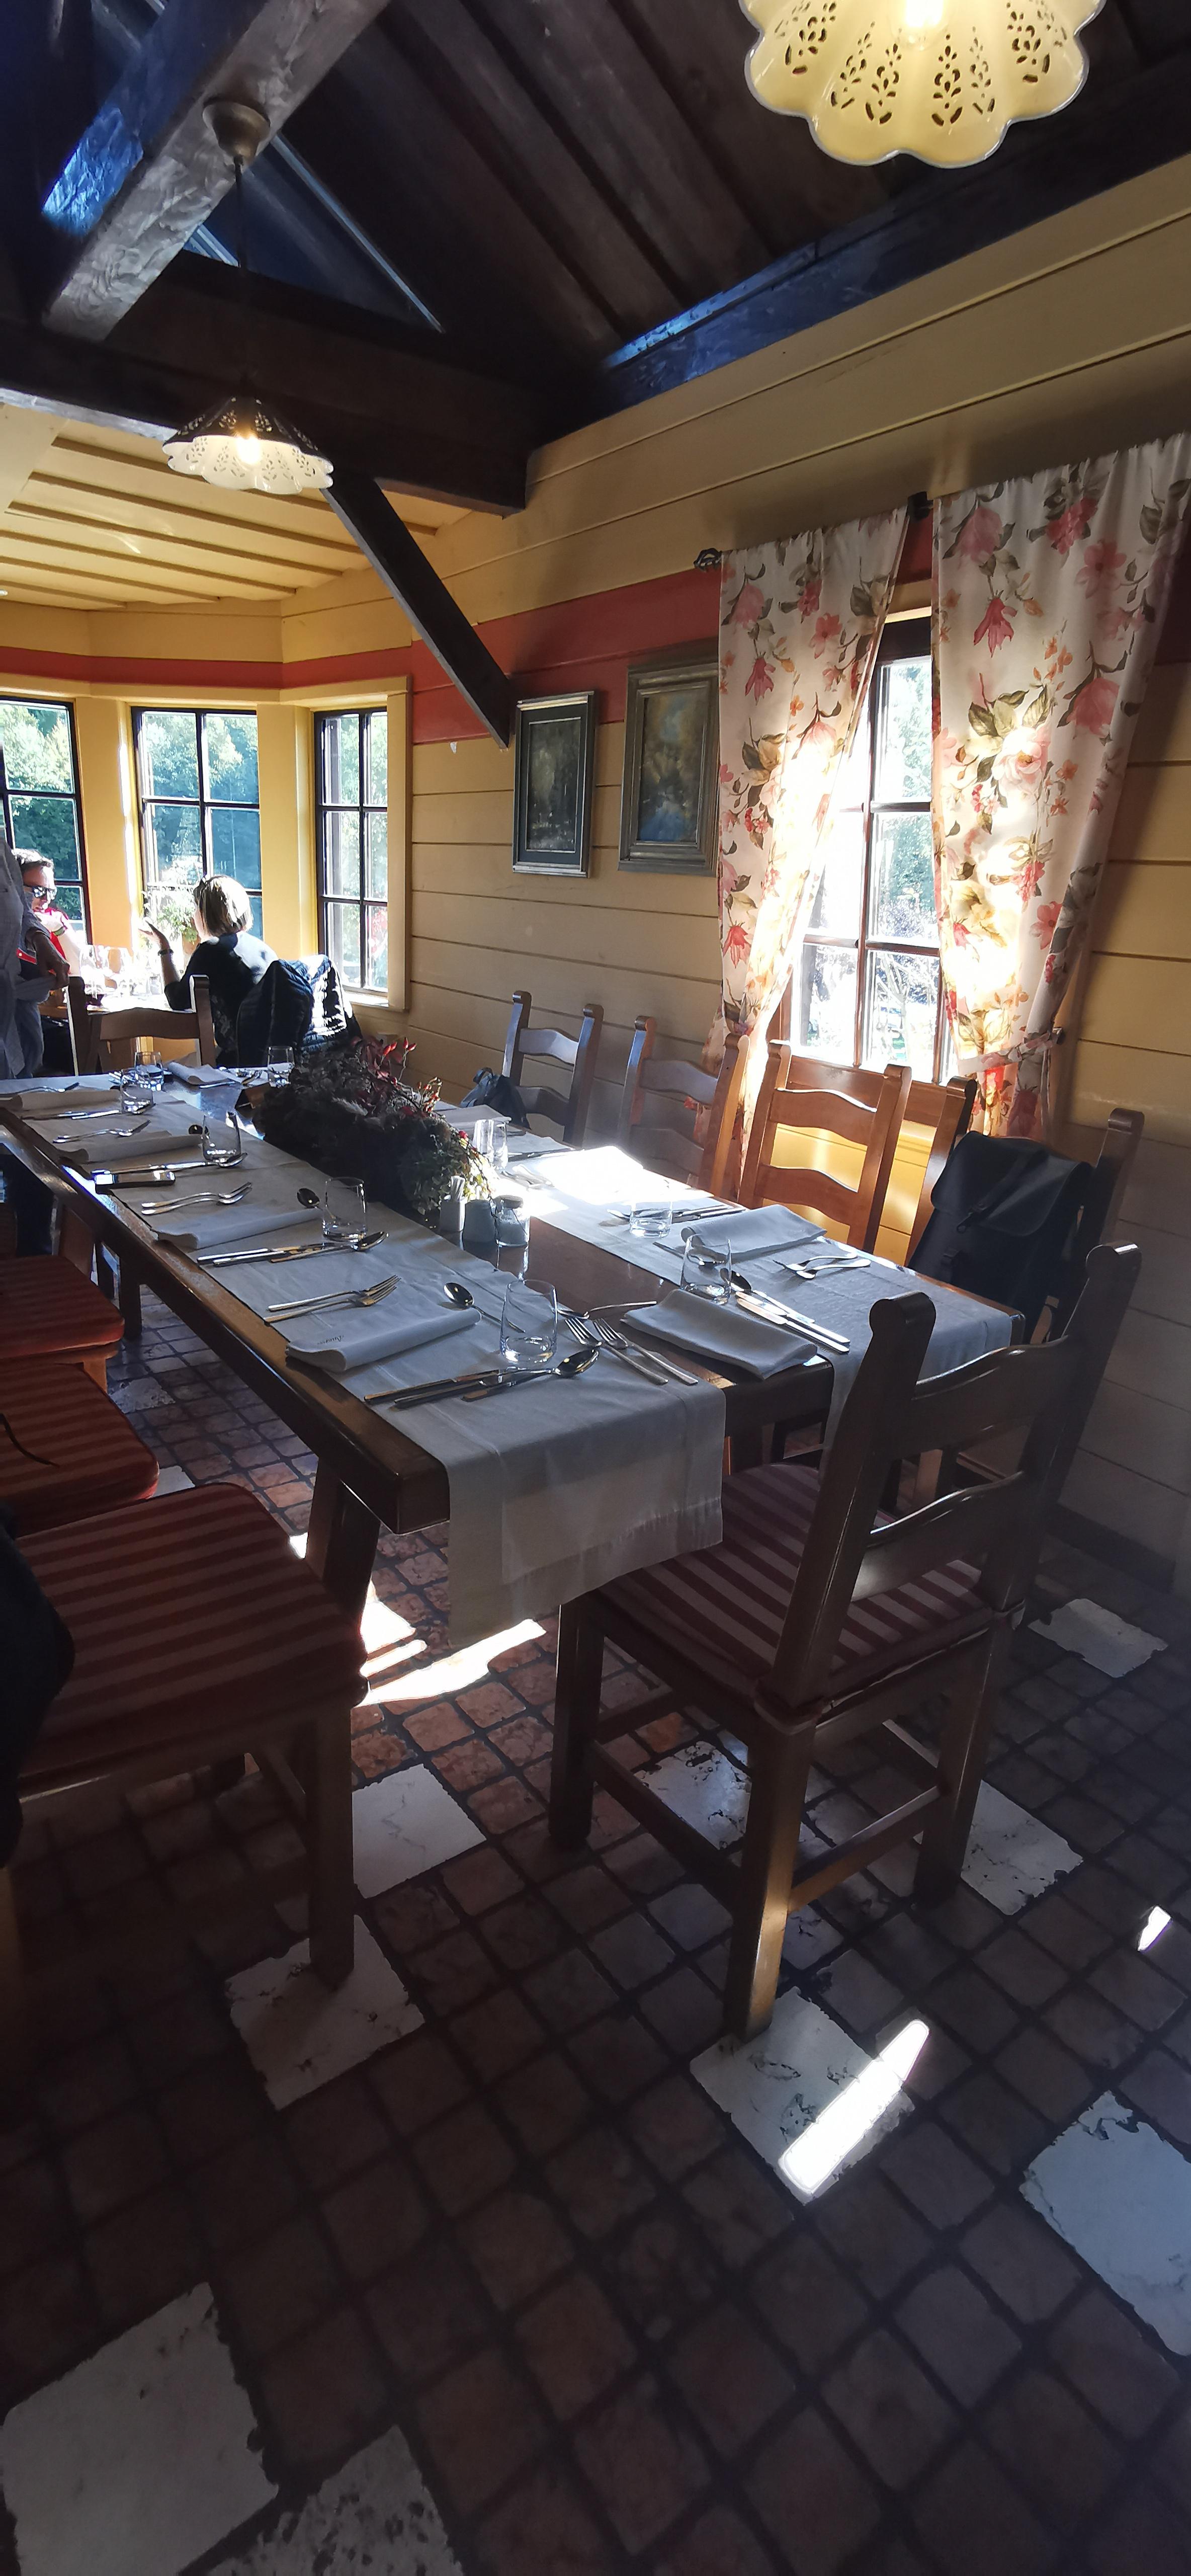 Amon-restoran-golf-foto-andrejamilas